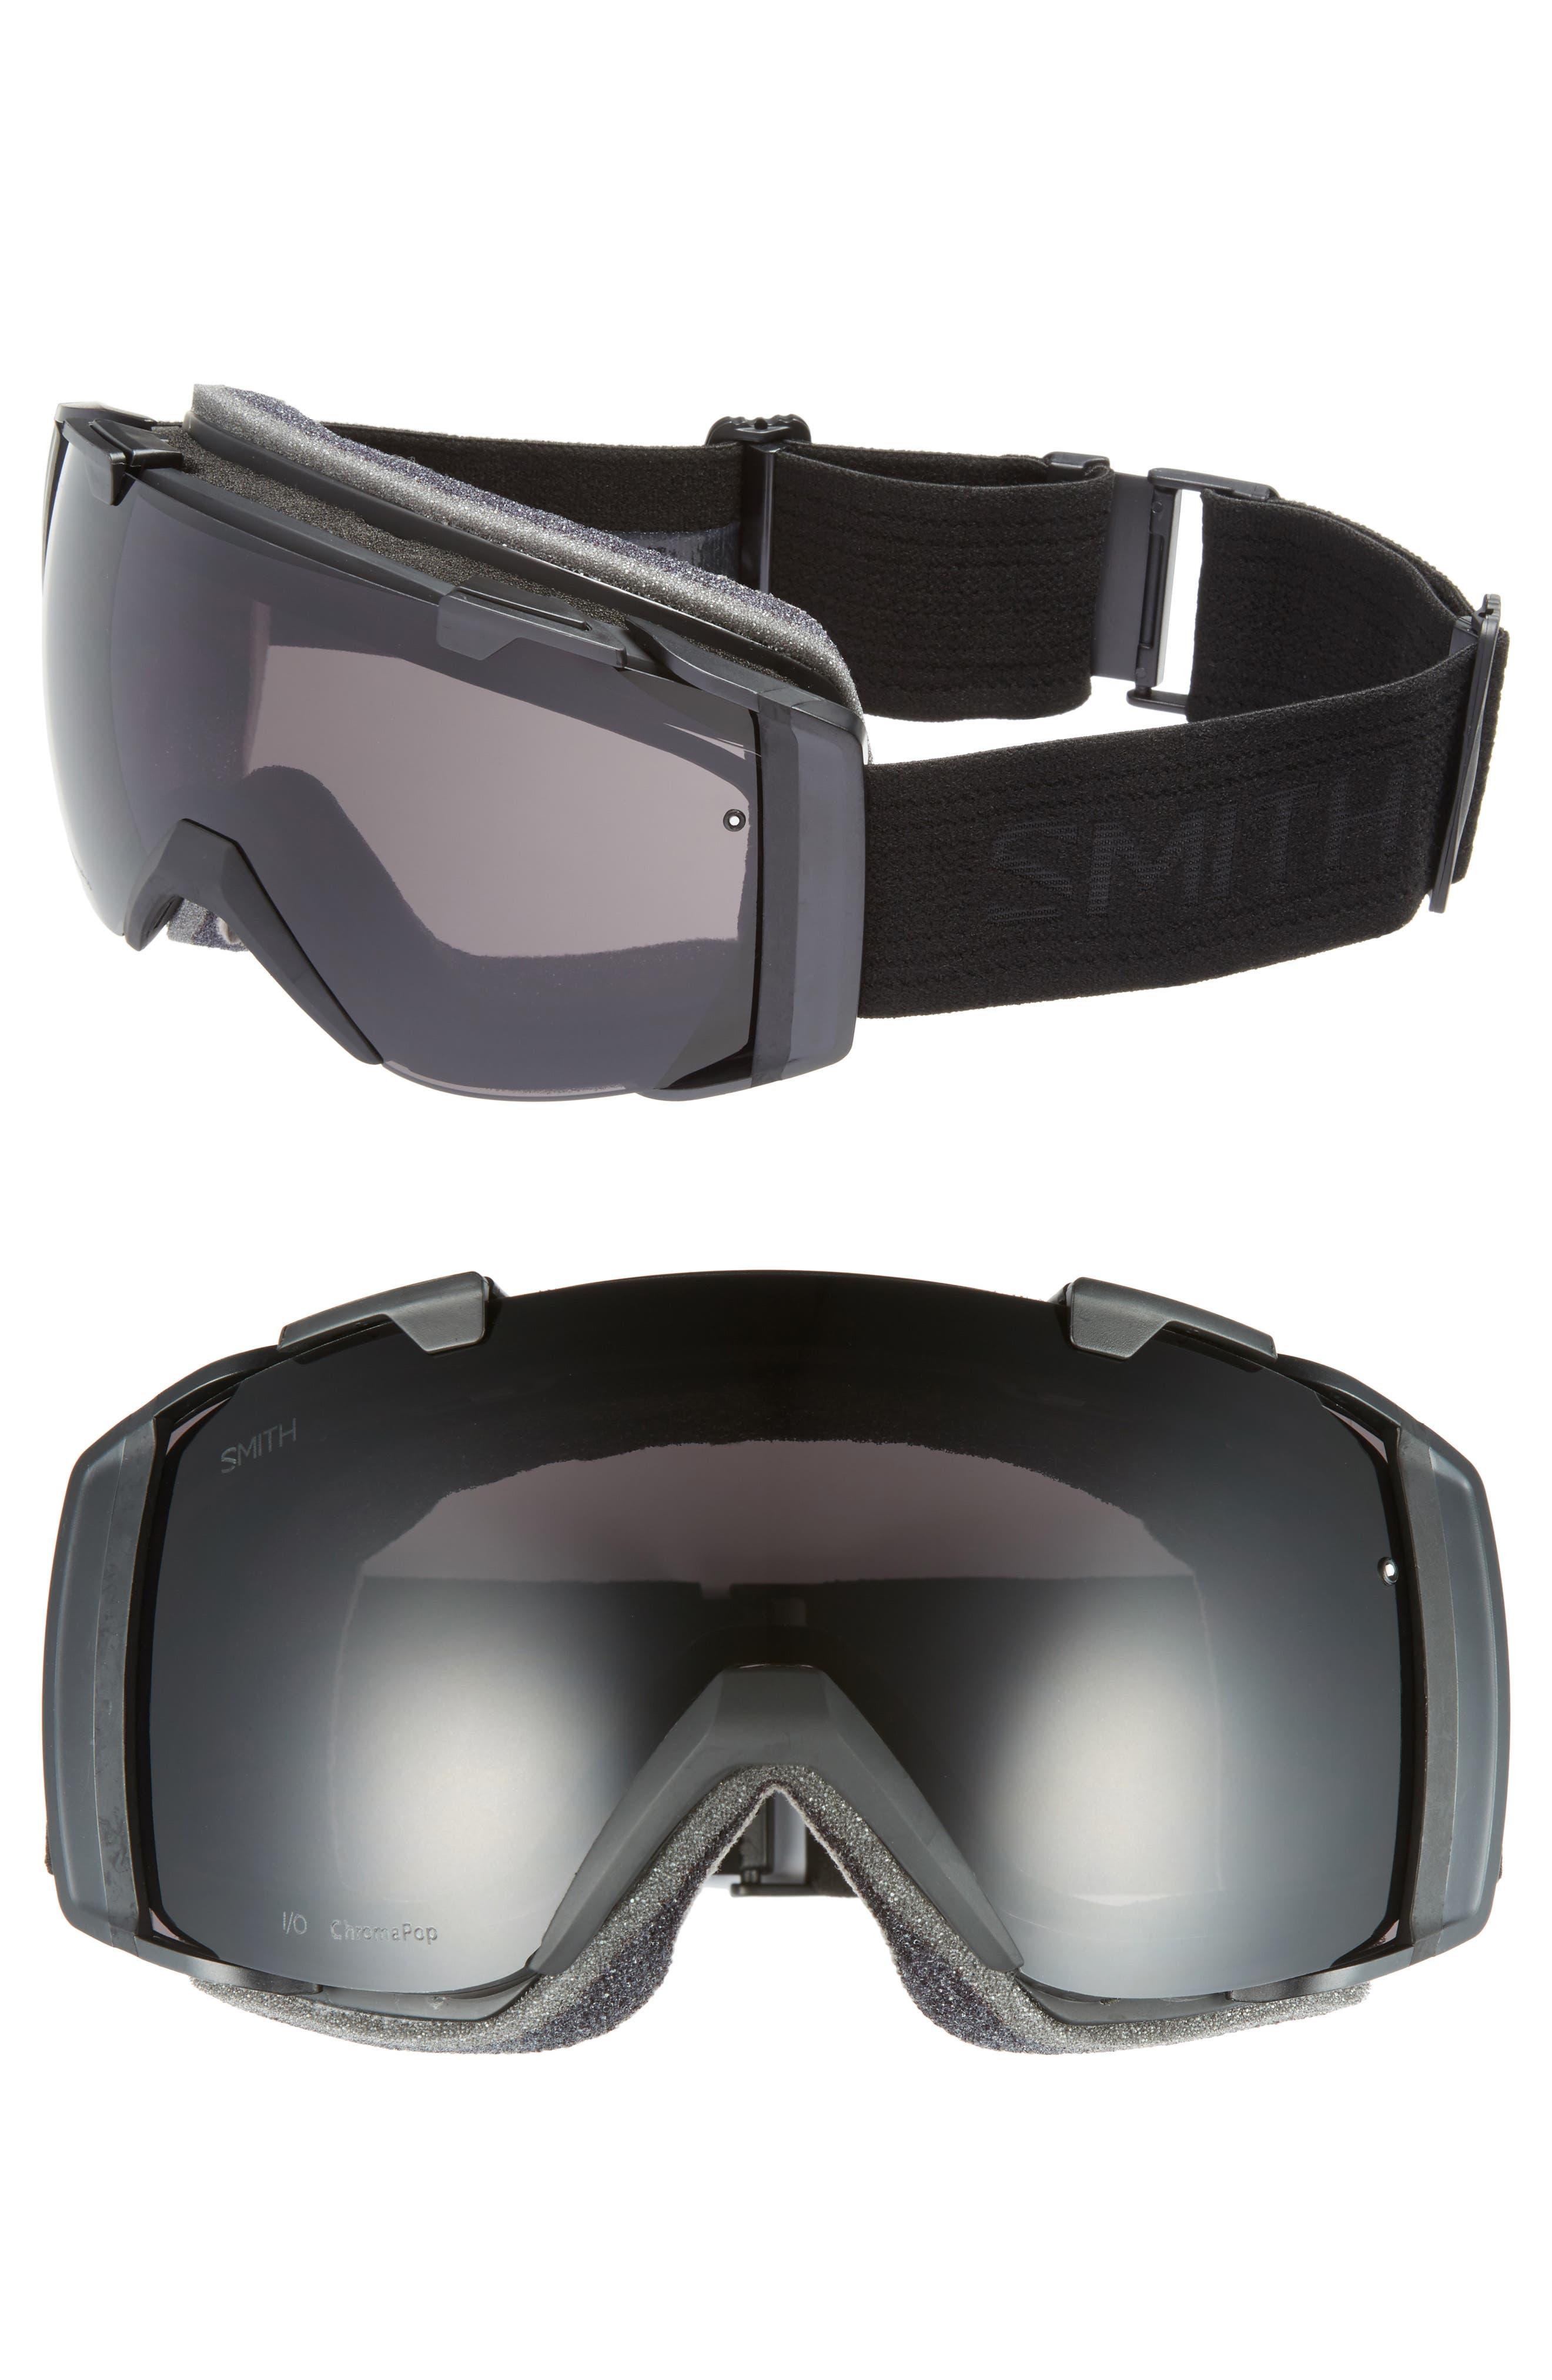 Main Image - Smith I/O 180mm Snow/Ski Goggles